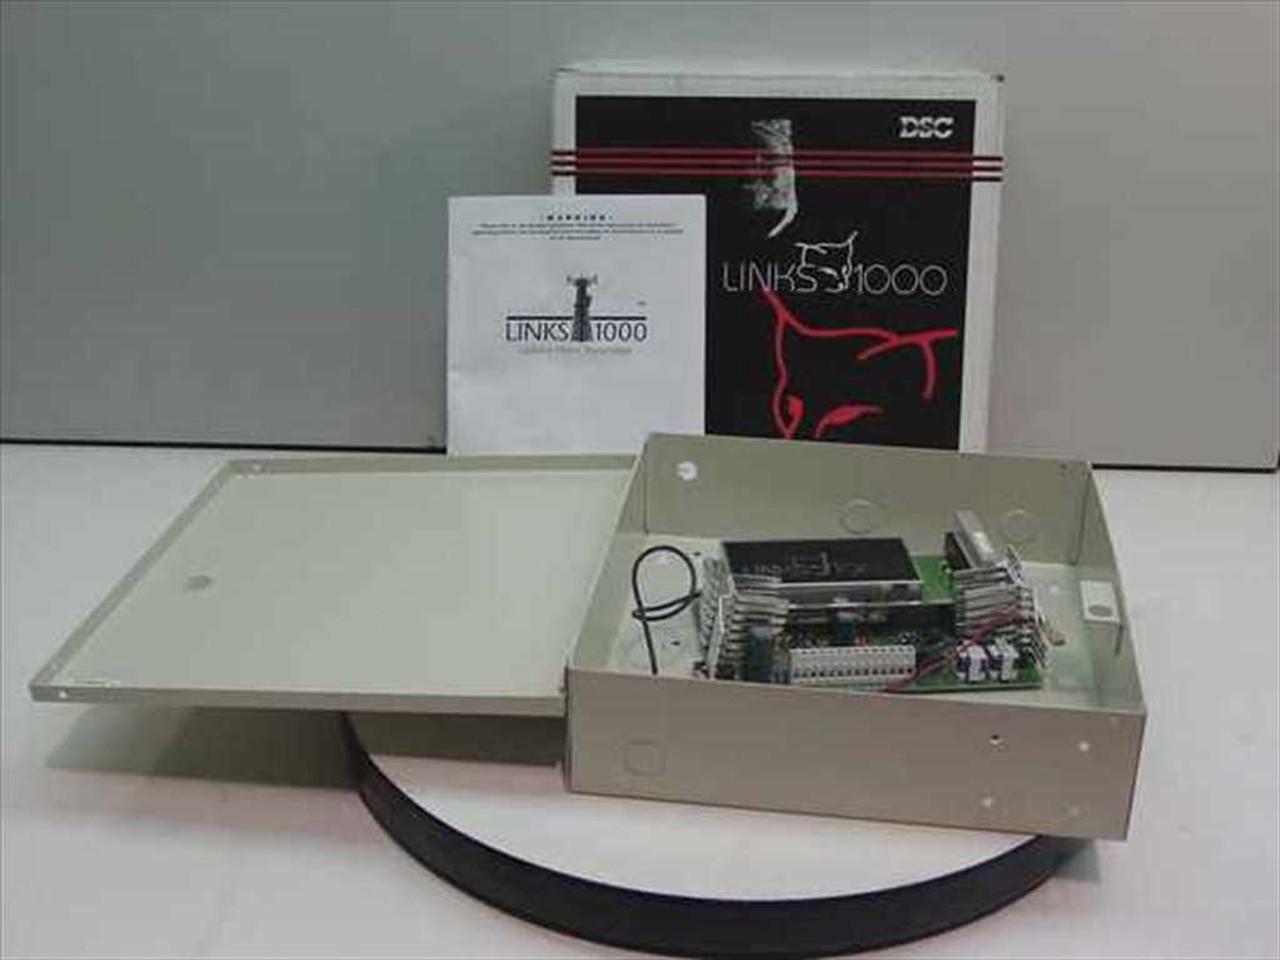 DSC Cellular Alarm Transmitter SG Communications Links1000